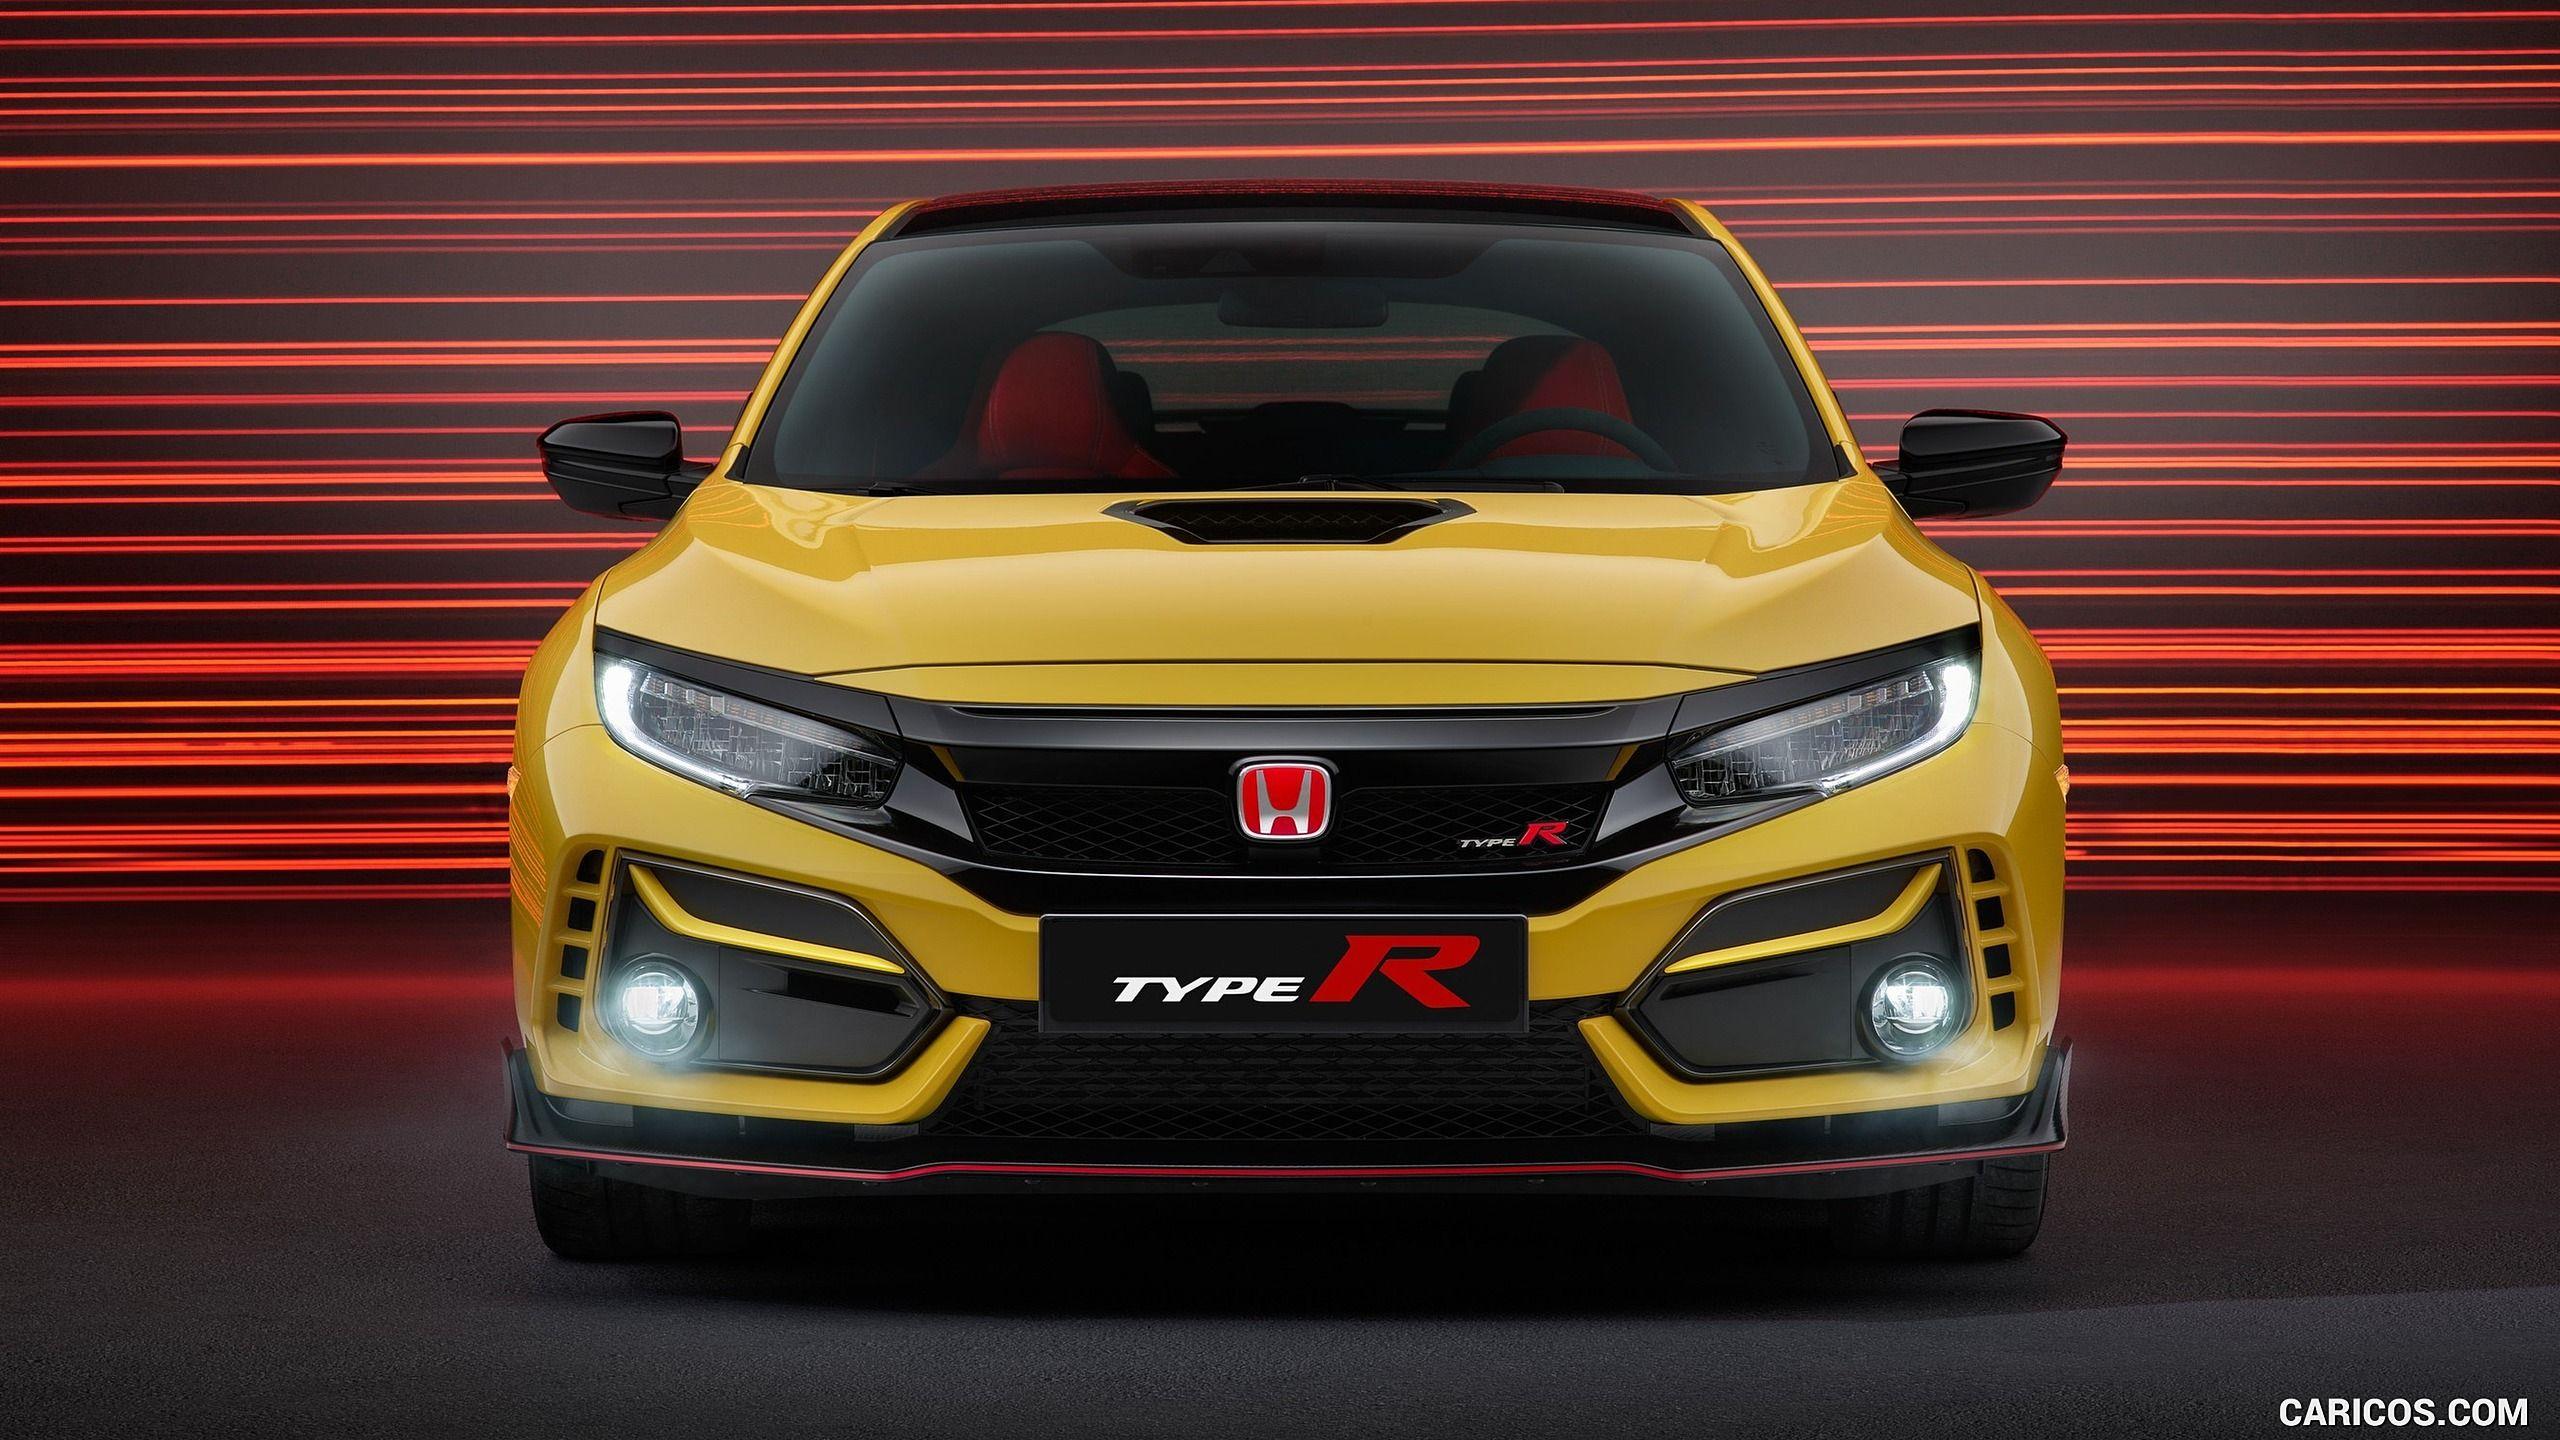 2019 honda civic coupe sport 4k wallpaper | hd car wallpapers | id. Honda Civic 2021 Wallpapers Wallpaper Cave